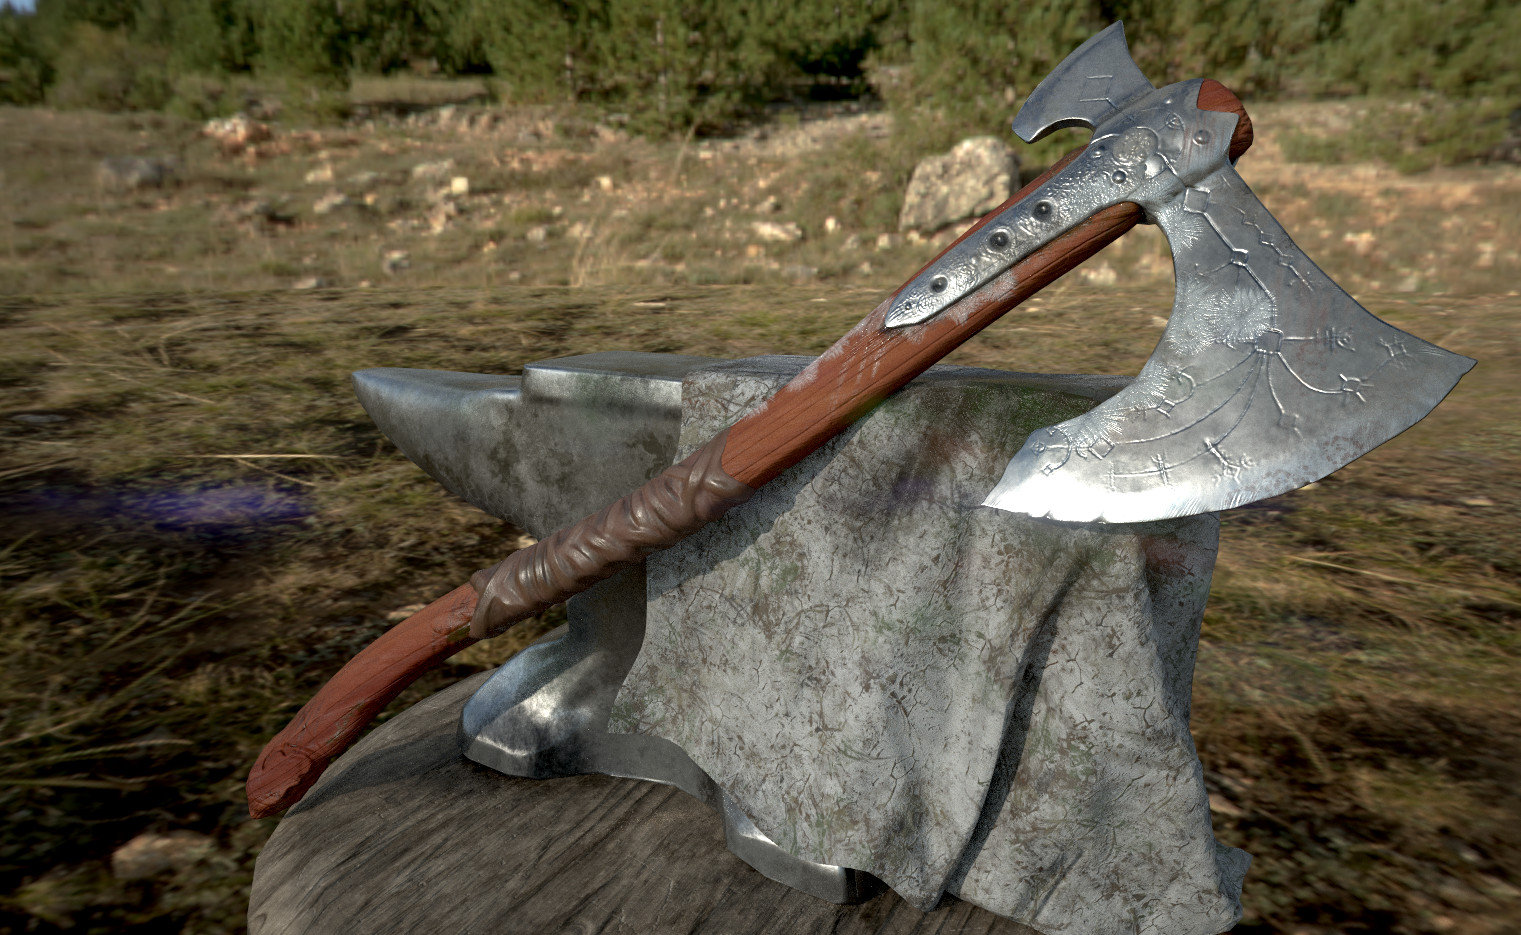 GOW Axe: Zbrush, Maya, Substance GOW axe